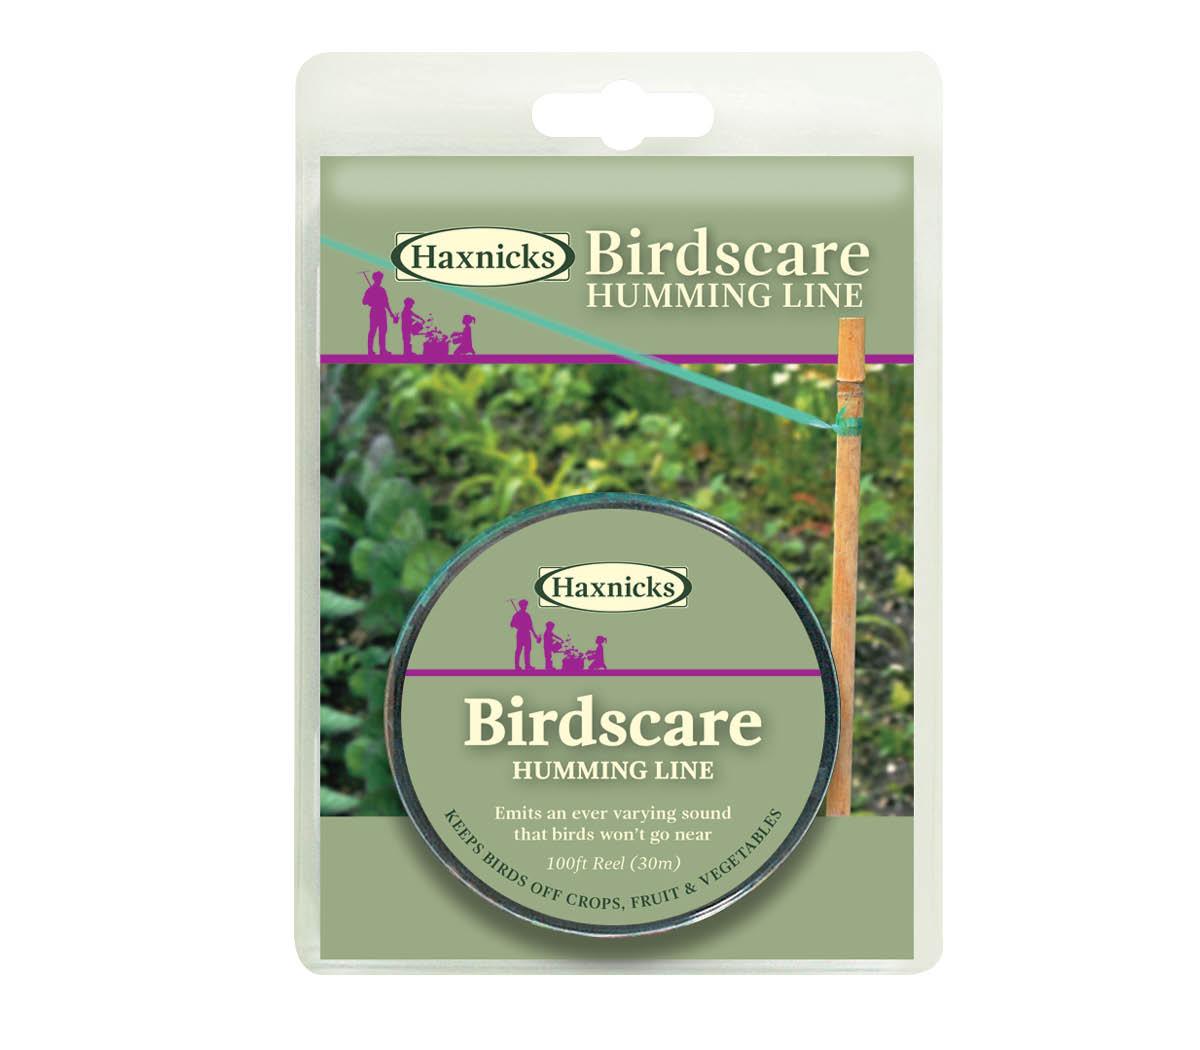 50-1510 Haxnicks Birdscare